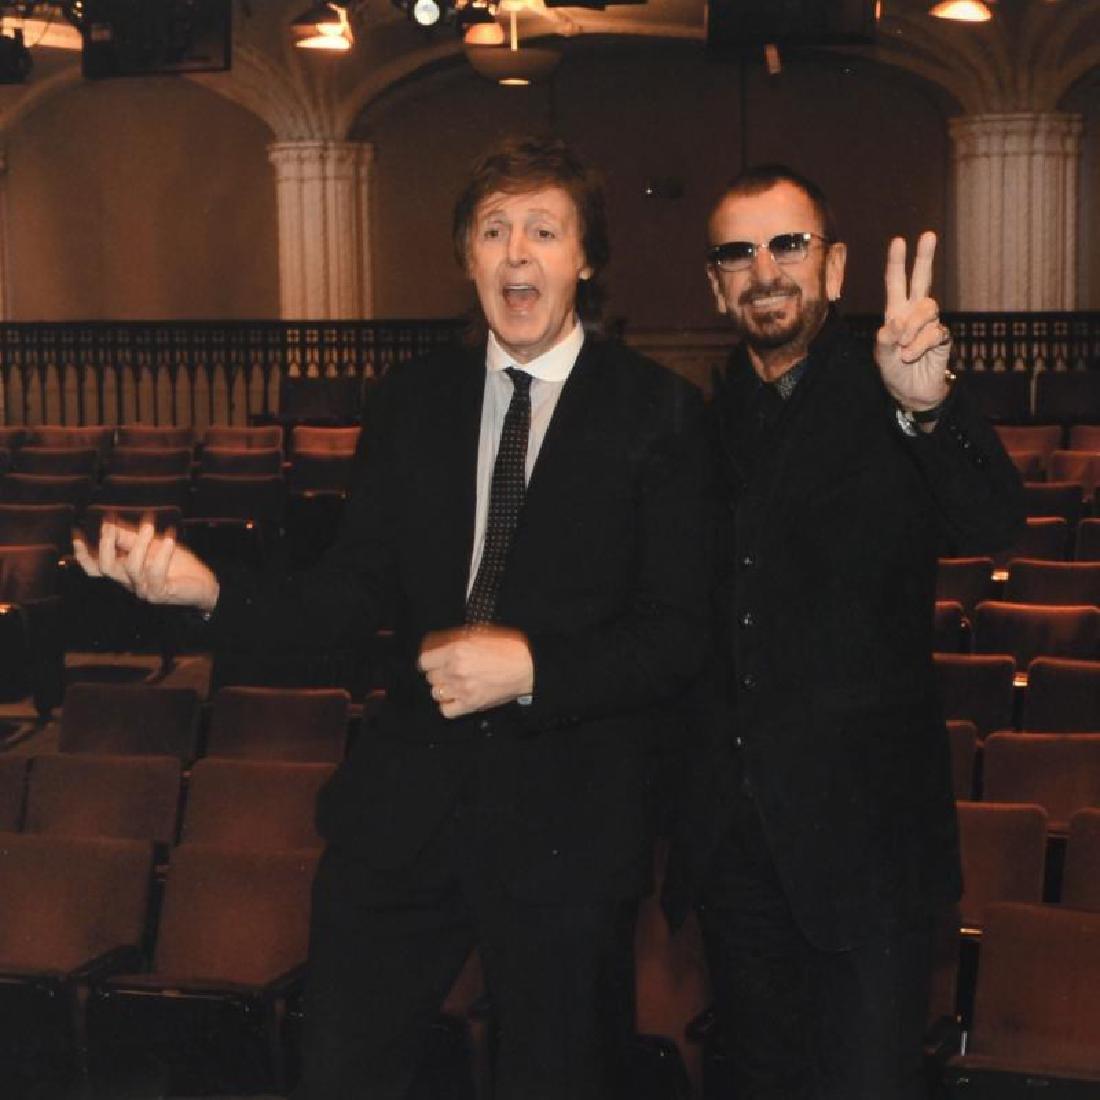 """Paul McCartney & Ringo Starr"" Limited Edition Giclee - 4"